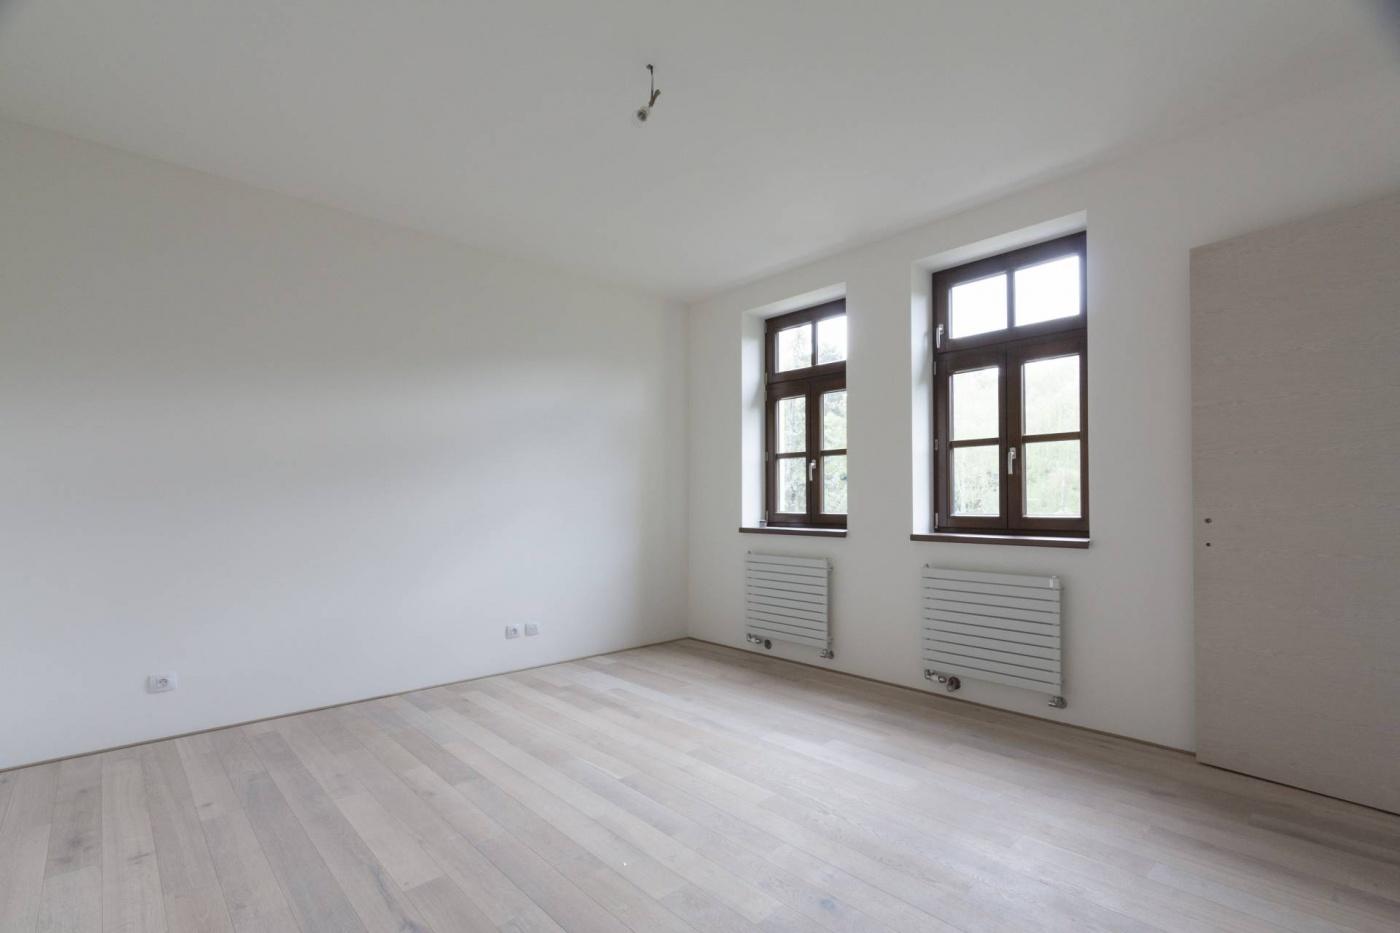 Půdní byt 2+kk, plocha 79 m², ulice Lumírova, Praha 2 - Vyšehrad, cena 7 490 000 Kč | 2